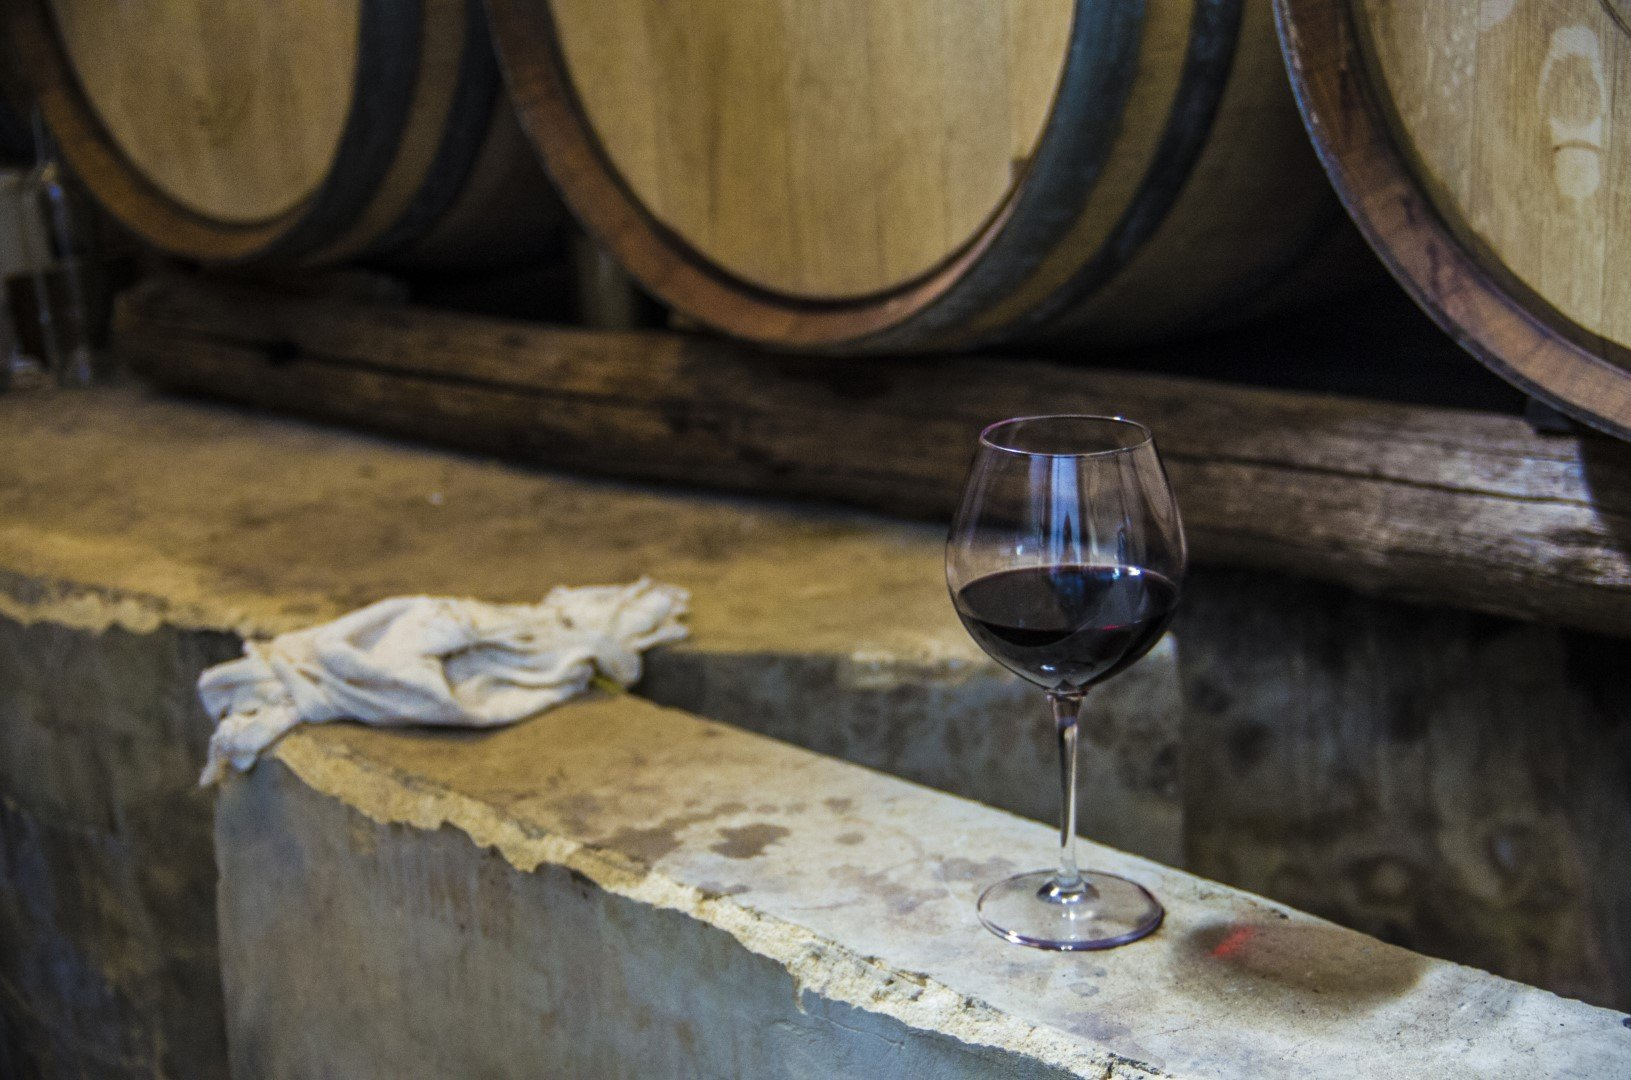 Tasting our Grand Cru wines